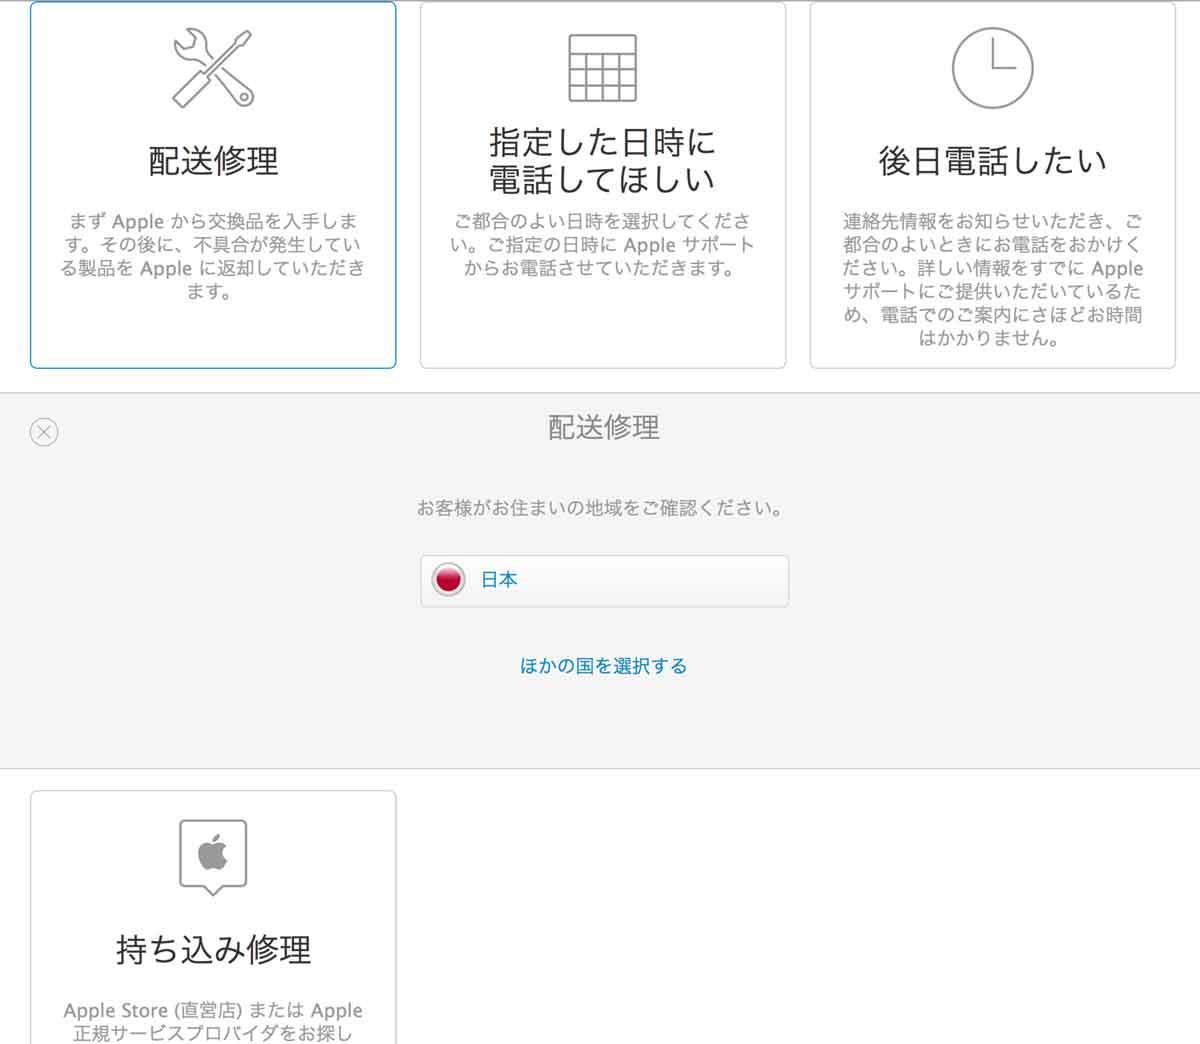 iPhoneのライトニングケーブル交換